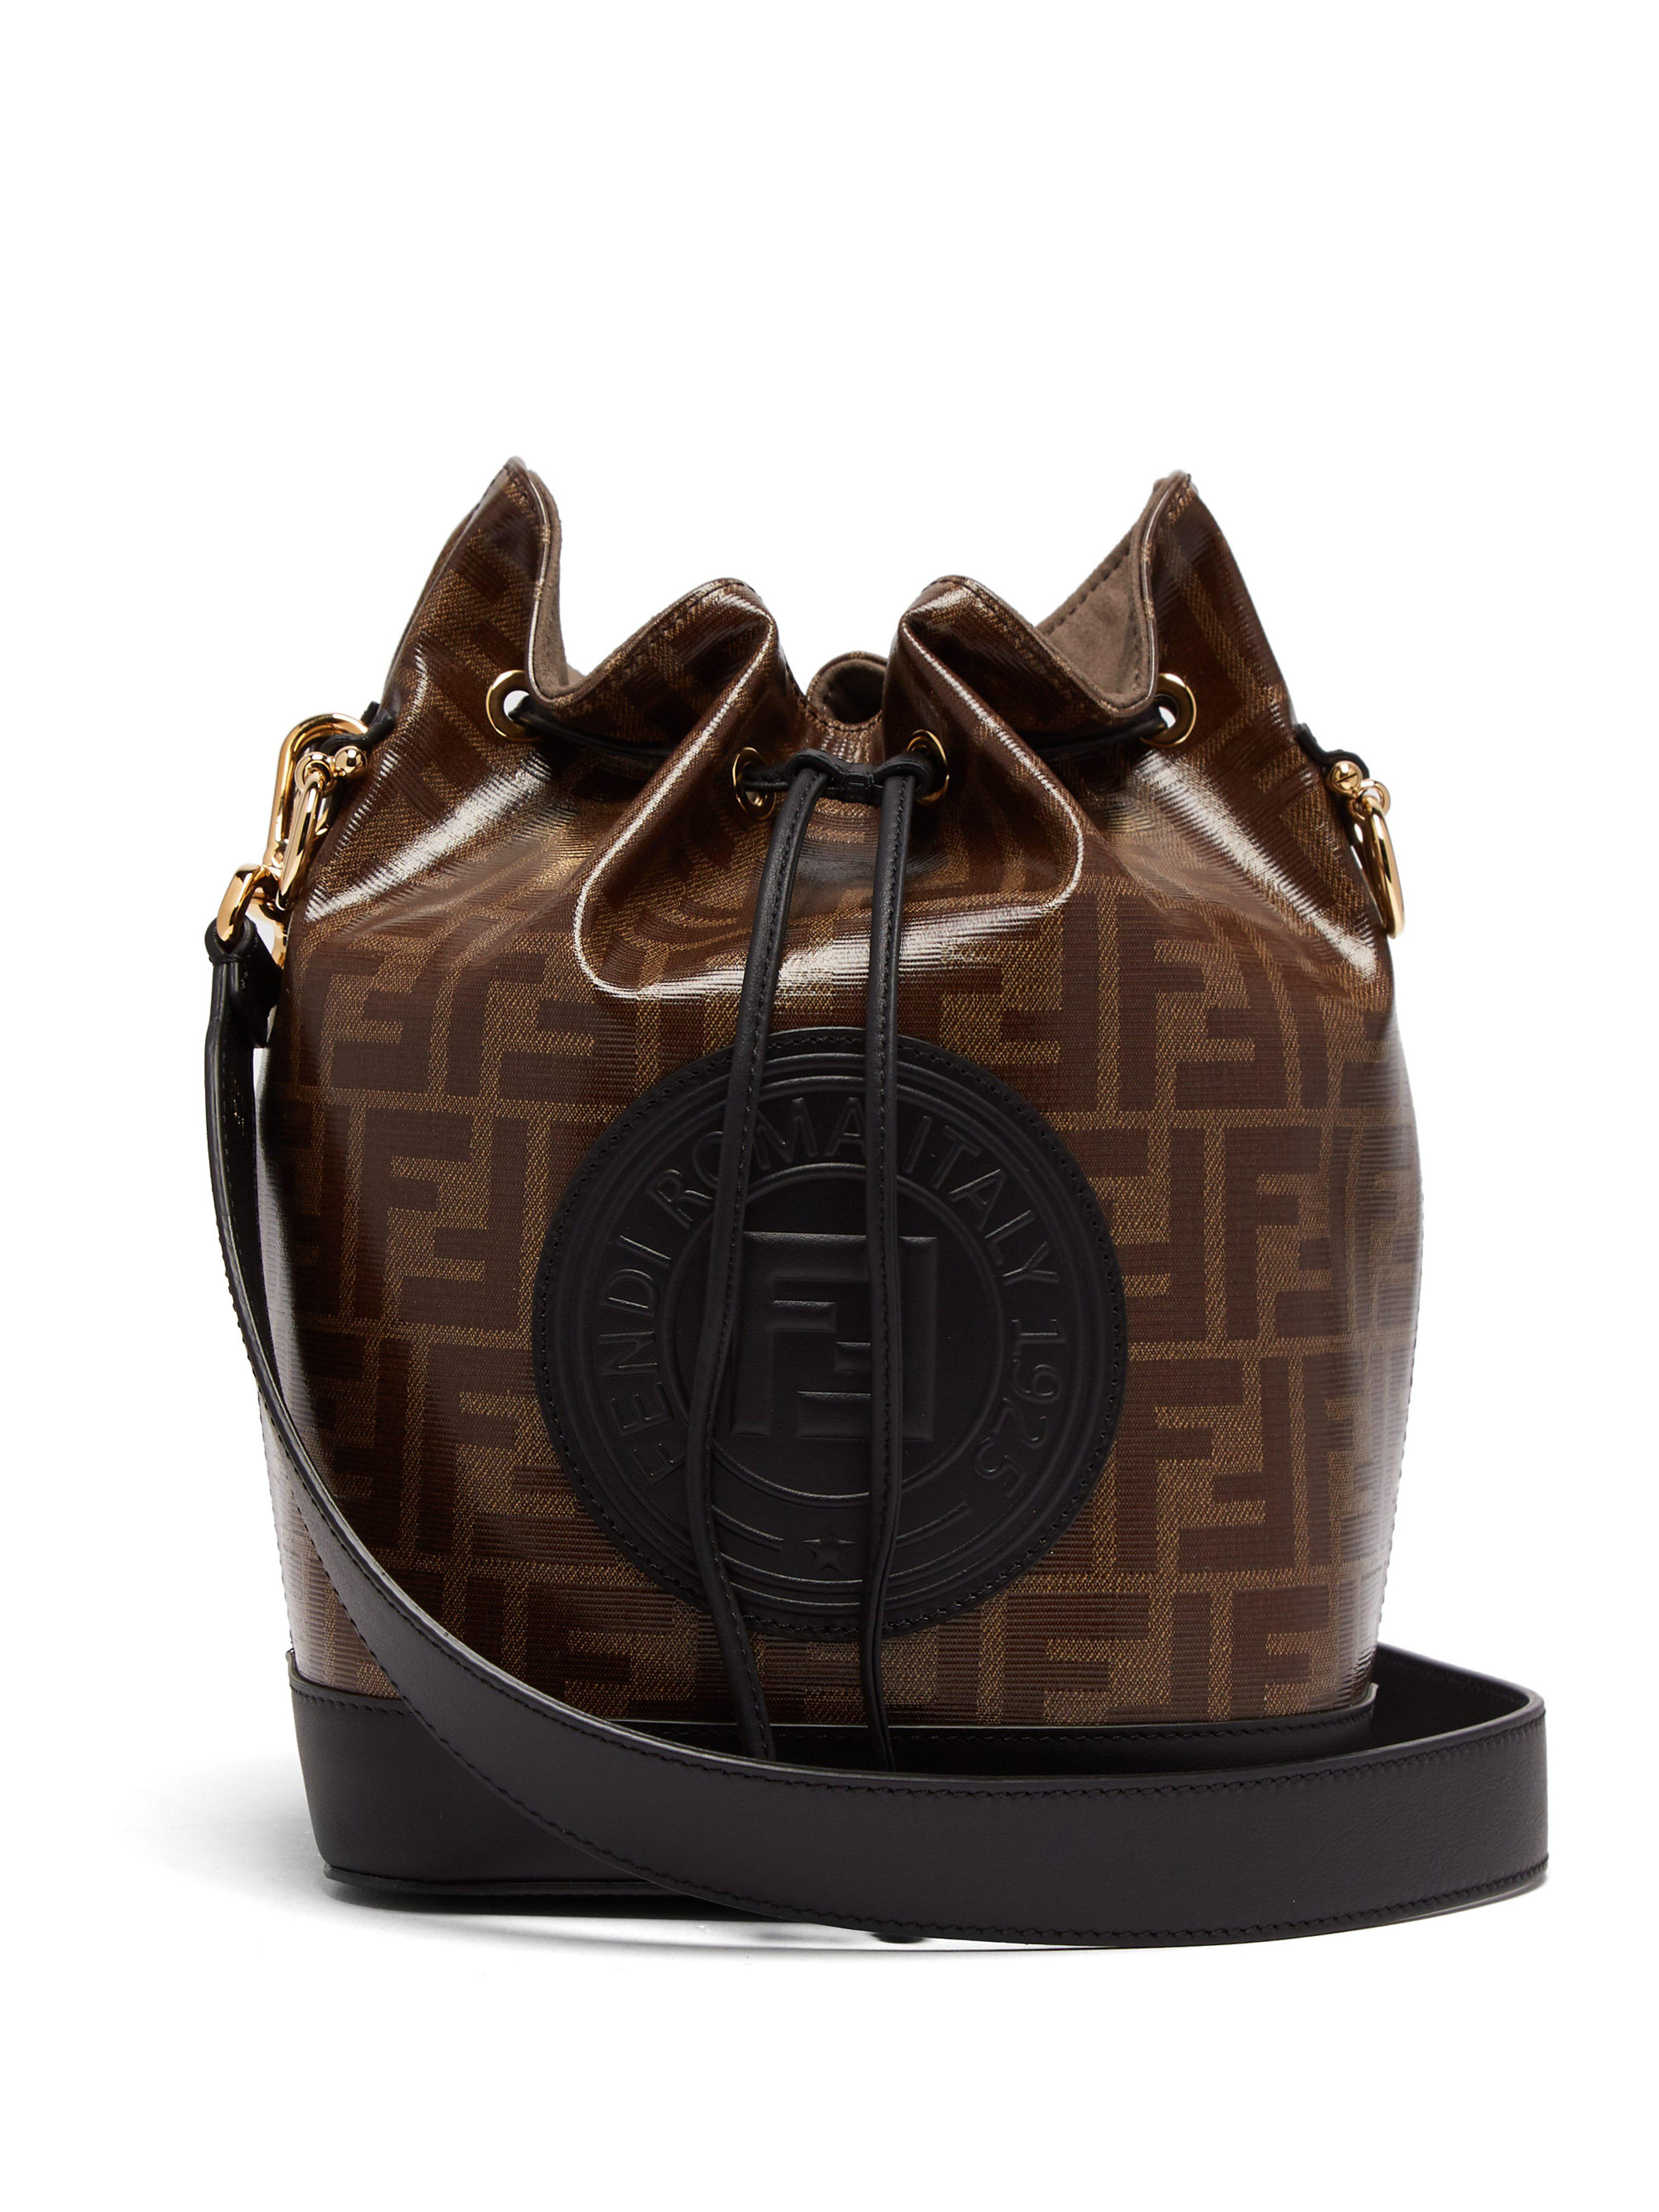 Fendi Mon Tresor Ff Jacquard Leather Bucket Bag in Brown - Lyst 9ccfec6f33d2a